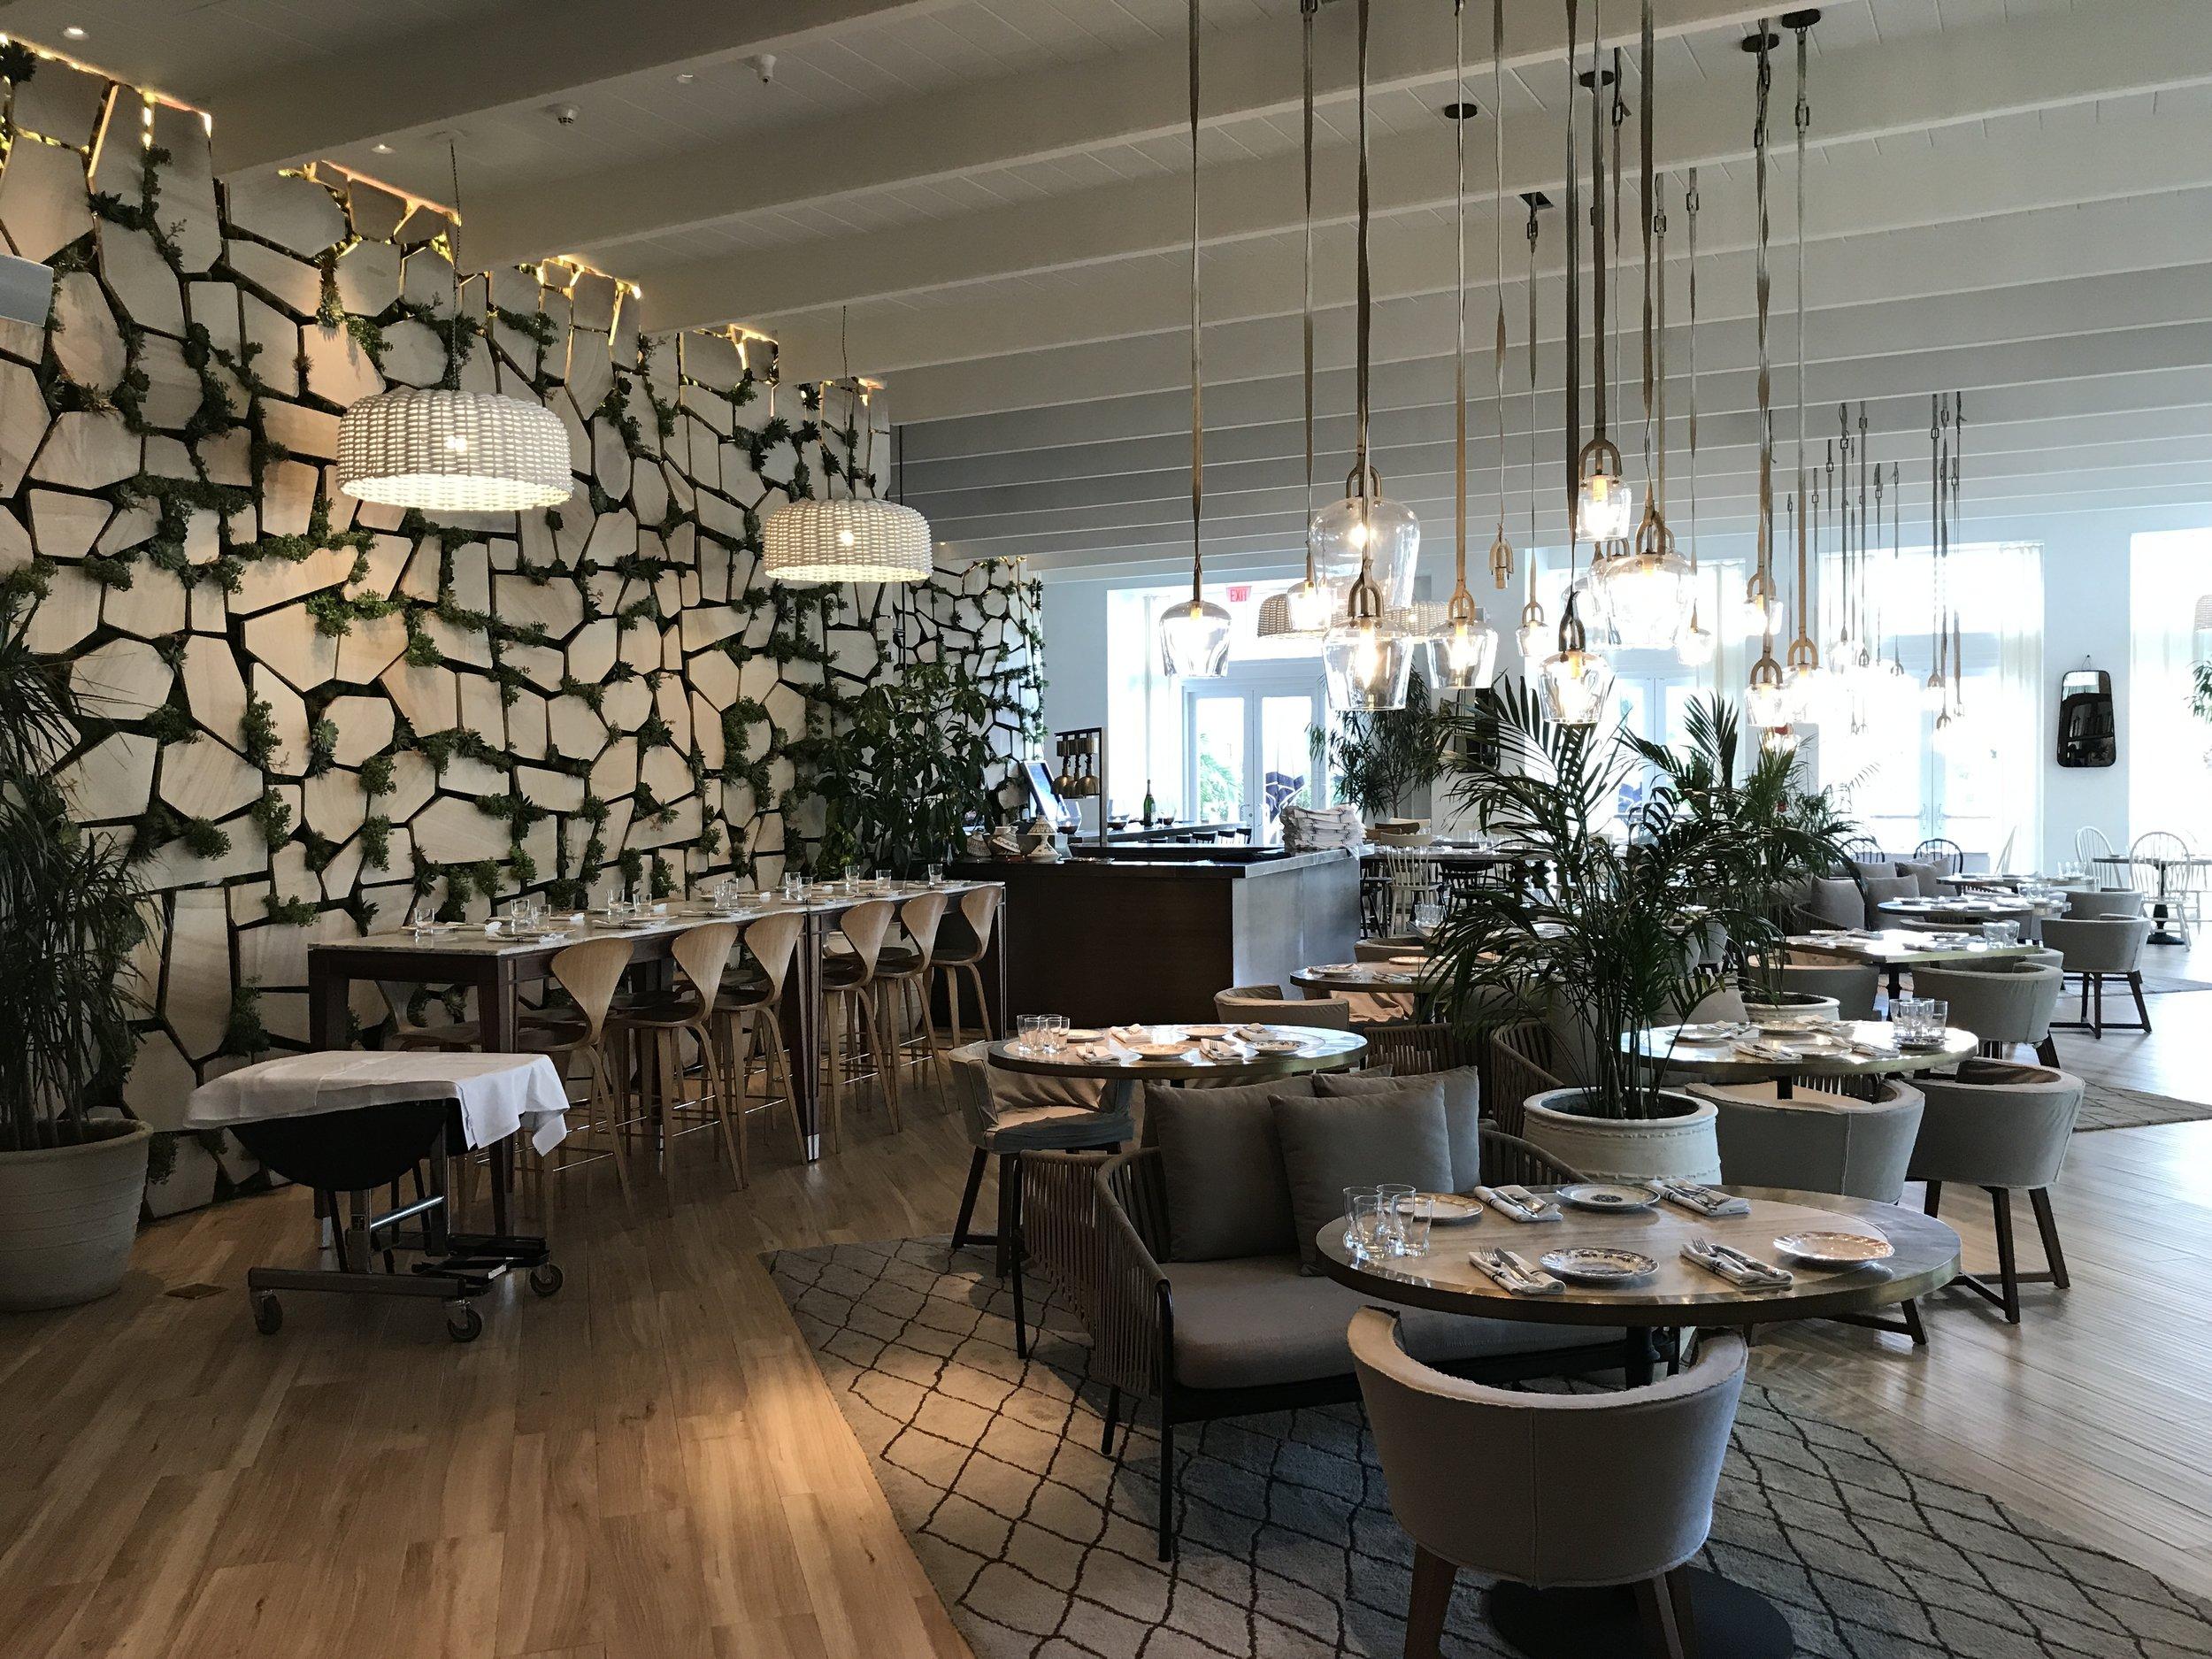 Cleo Restaurant_PDG_Tenant Improvement1.JPG